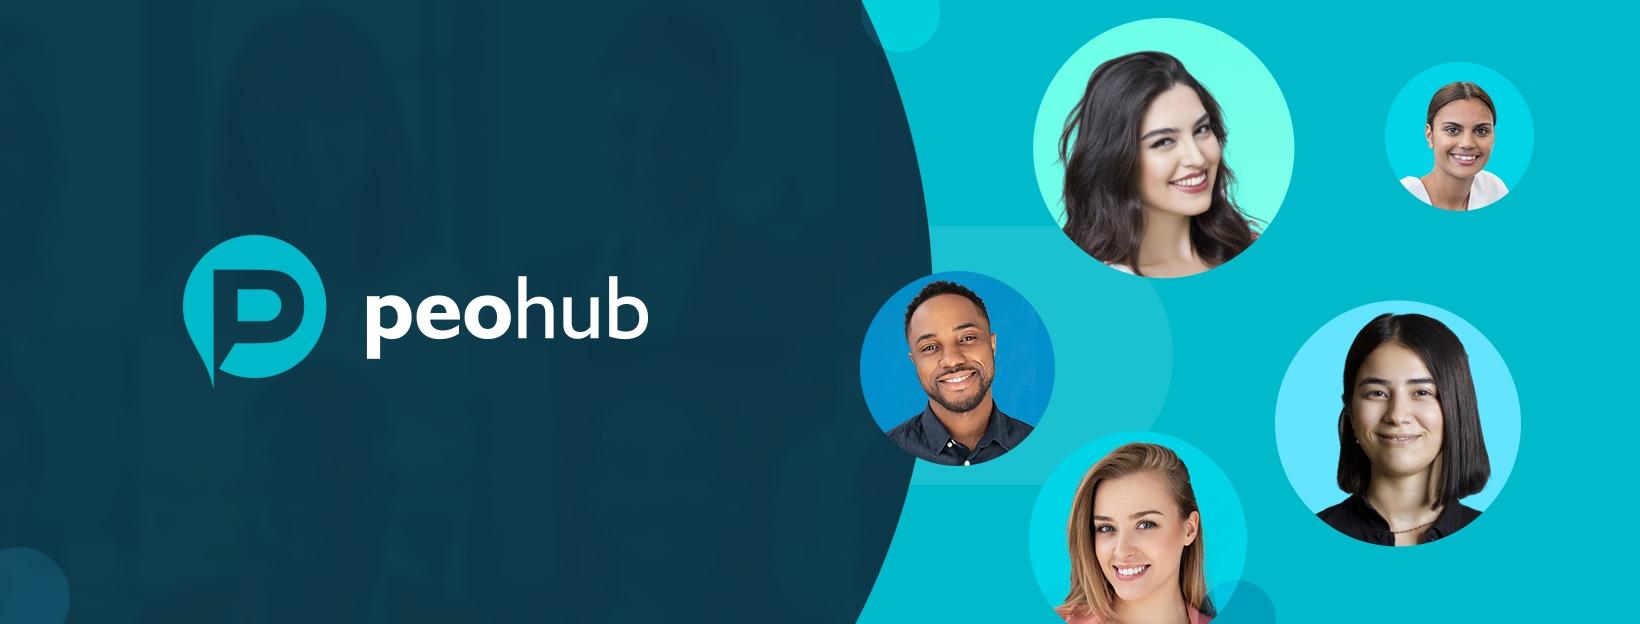 PEO Hub (@peohub) Cover Image